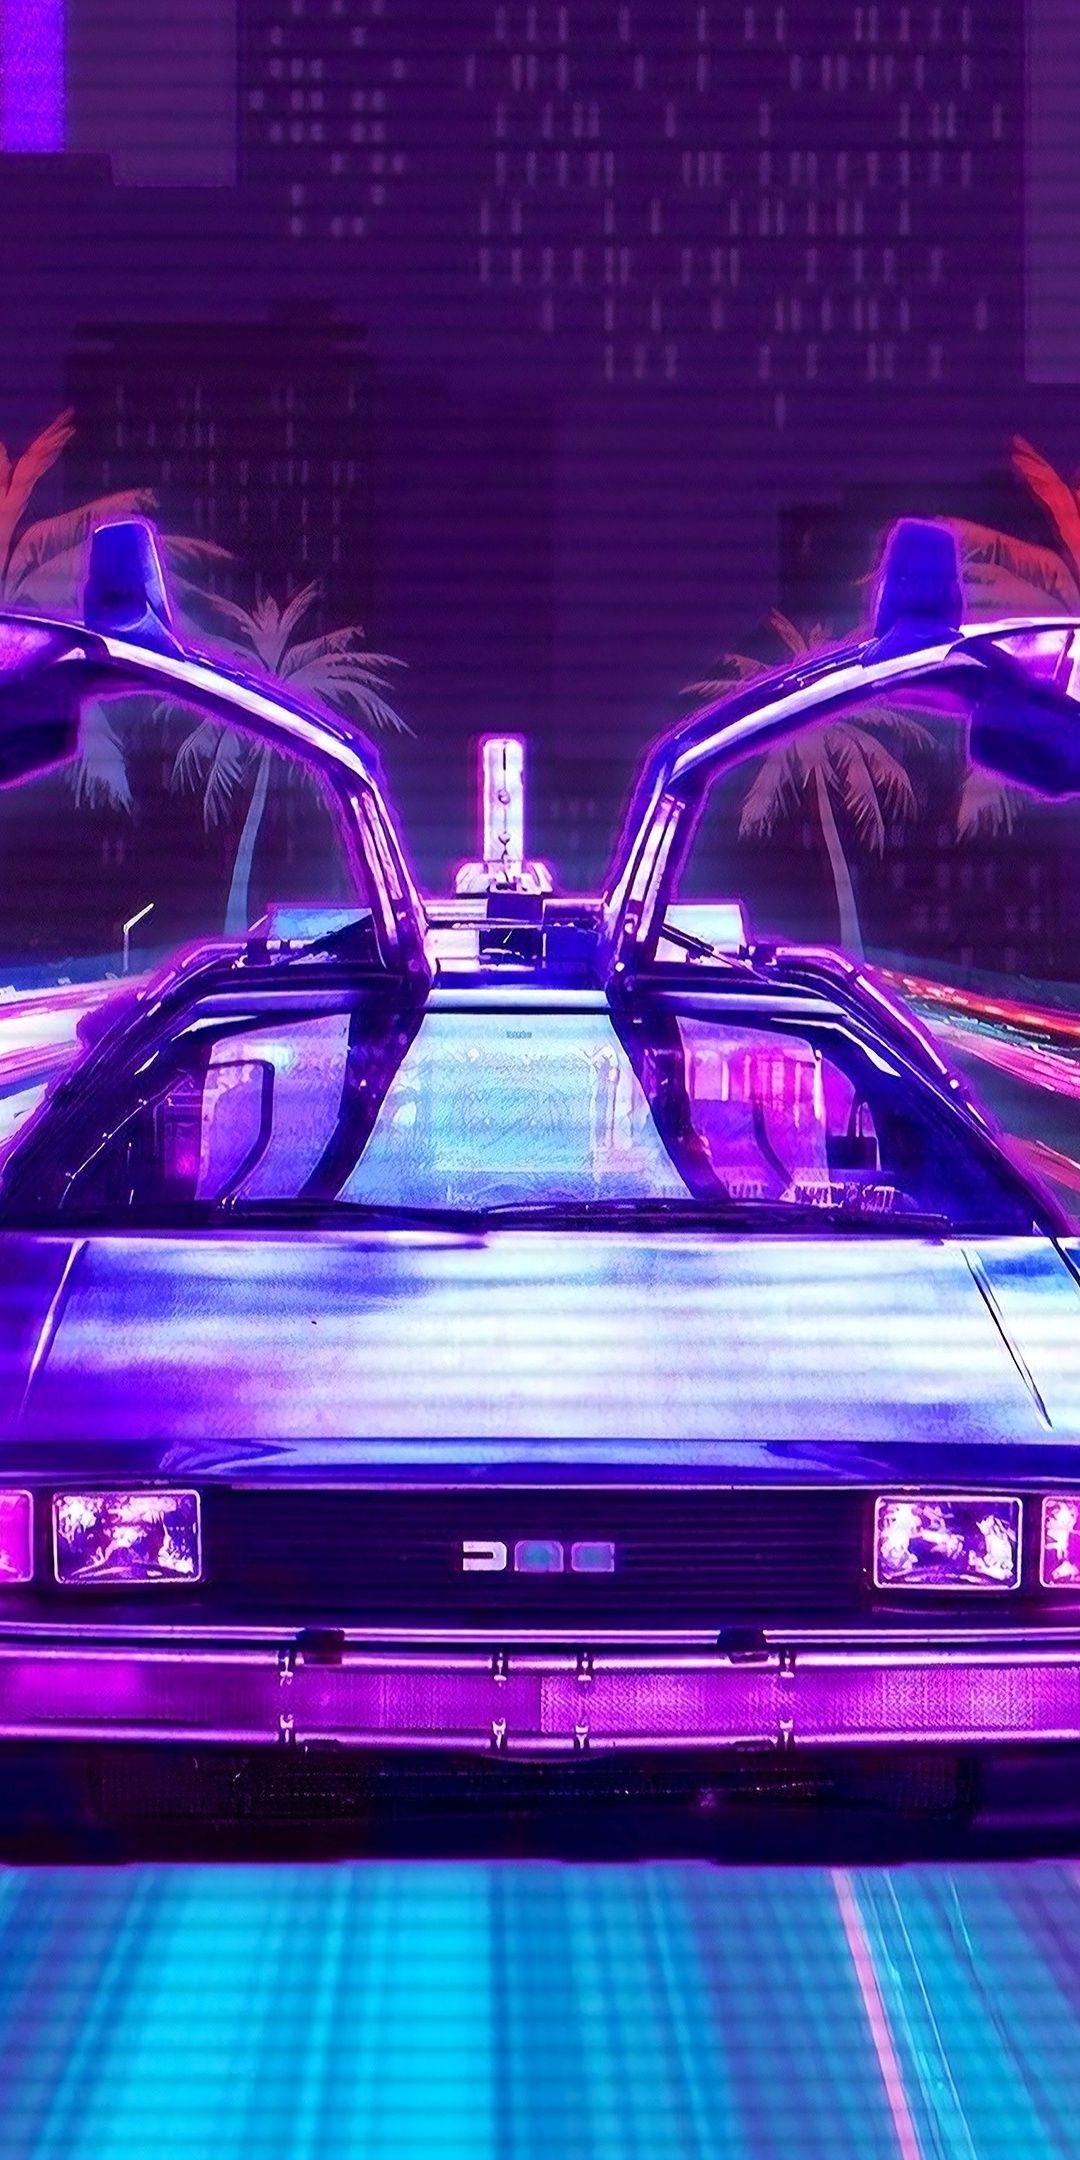 Retro Lux Cars Outdrive Retrowave 1080x2160 Wallpaper Retro Waves Retro Futurism Retro Graphic Design